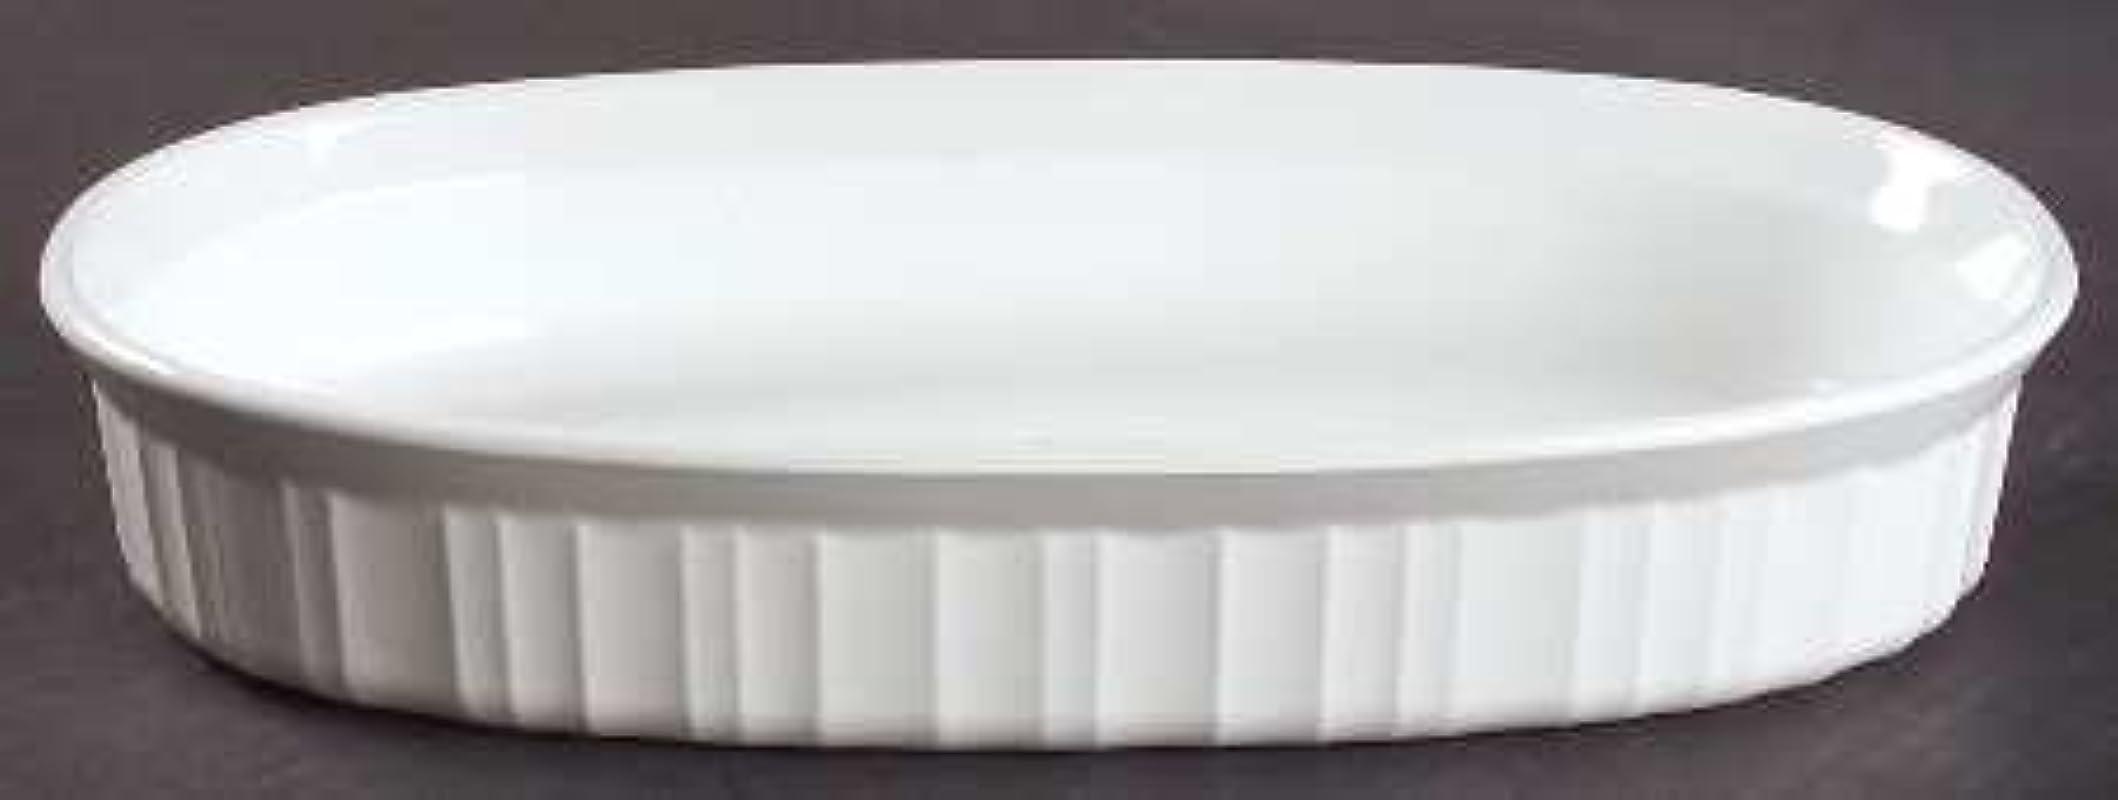 Vintage Corning Ware 10 French White Oblong Open Baking Dish F 7 B